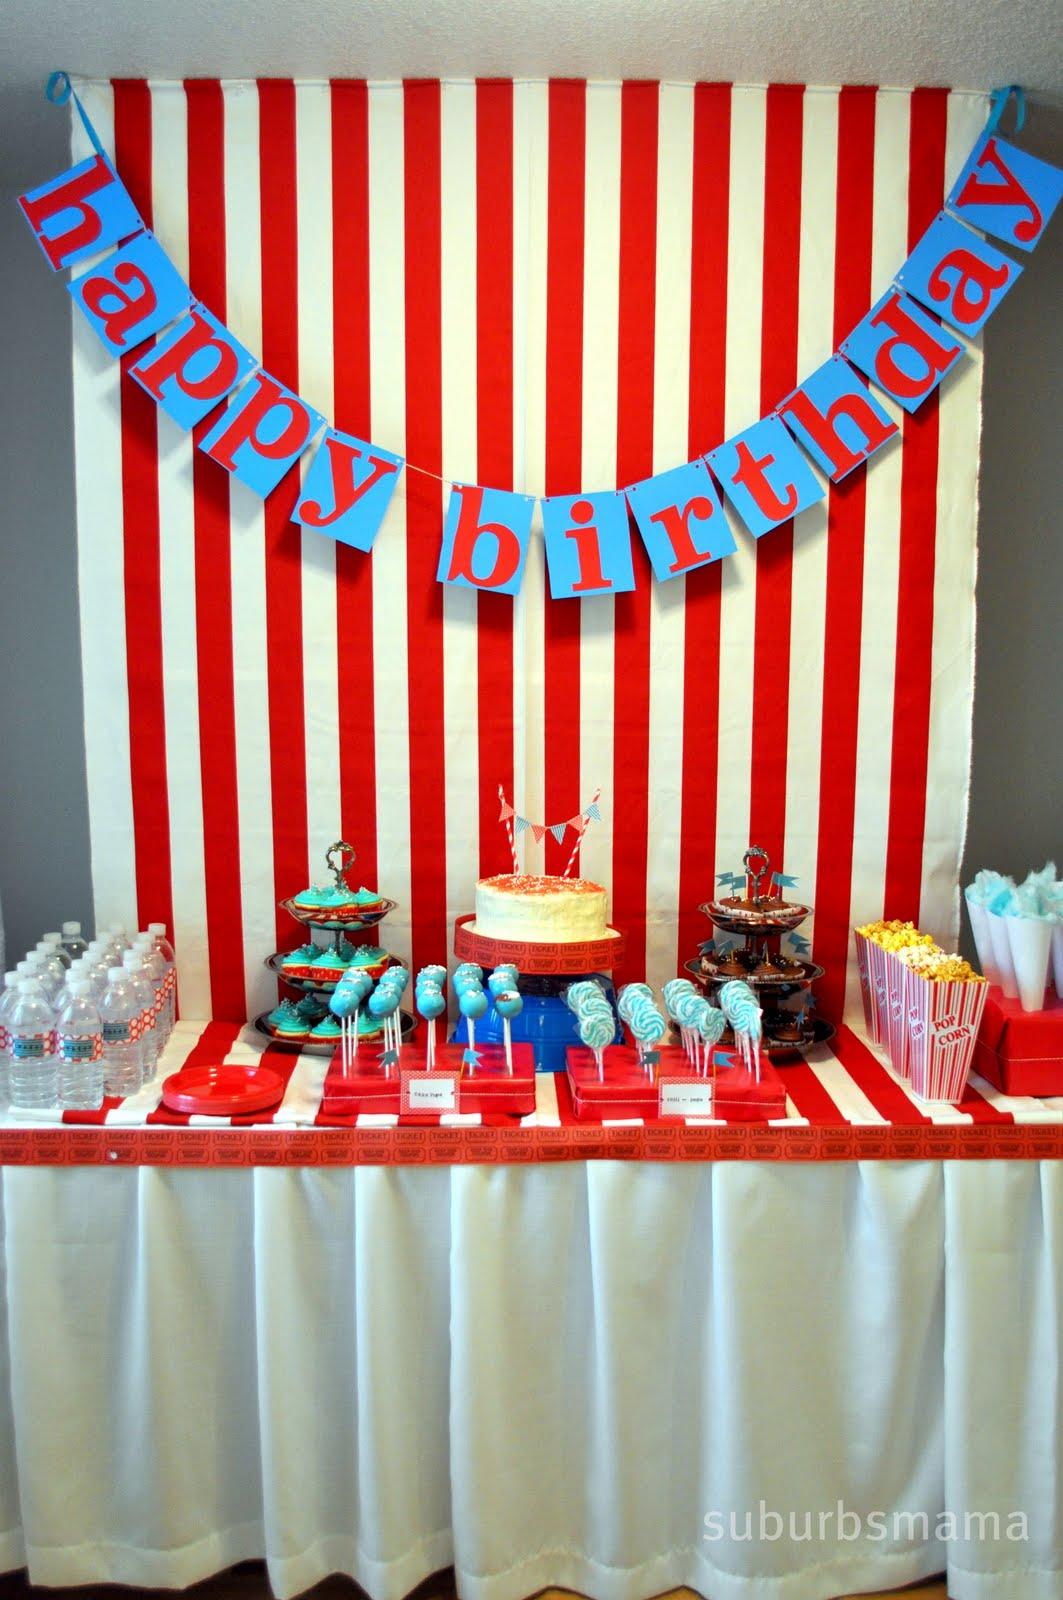 Suburbs Mama Carnival Themed Birthday Party Shared